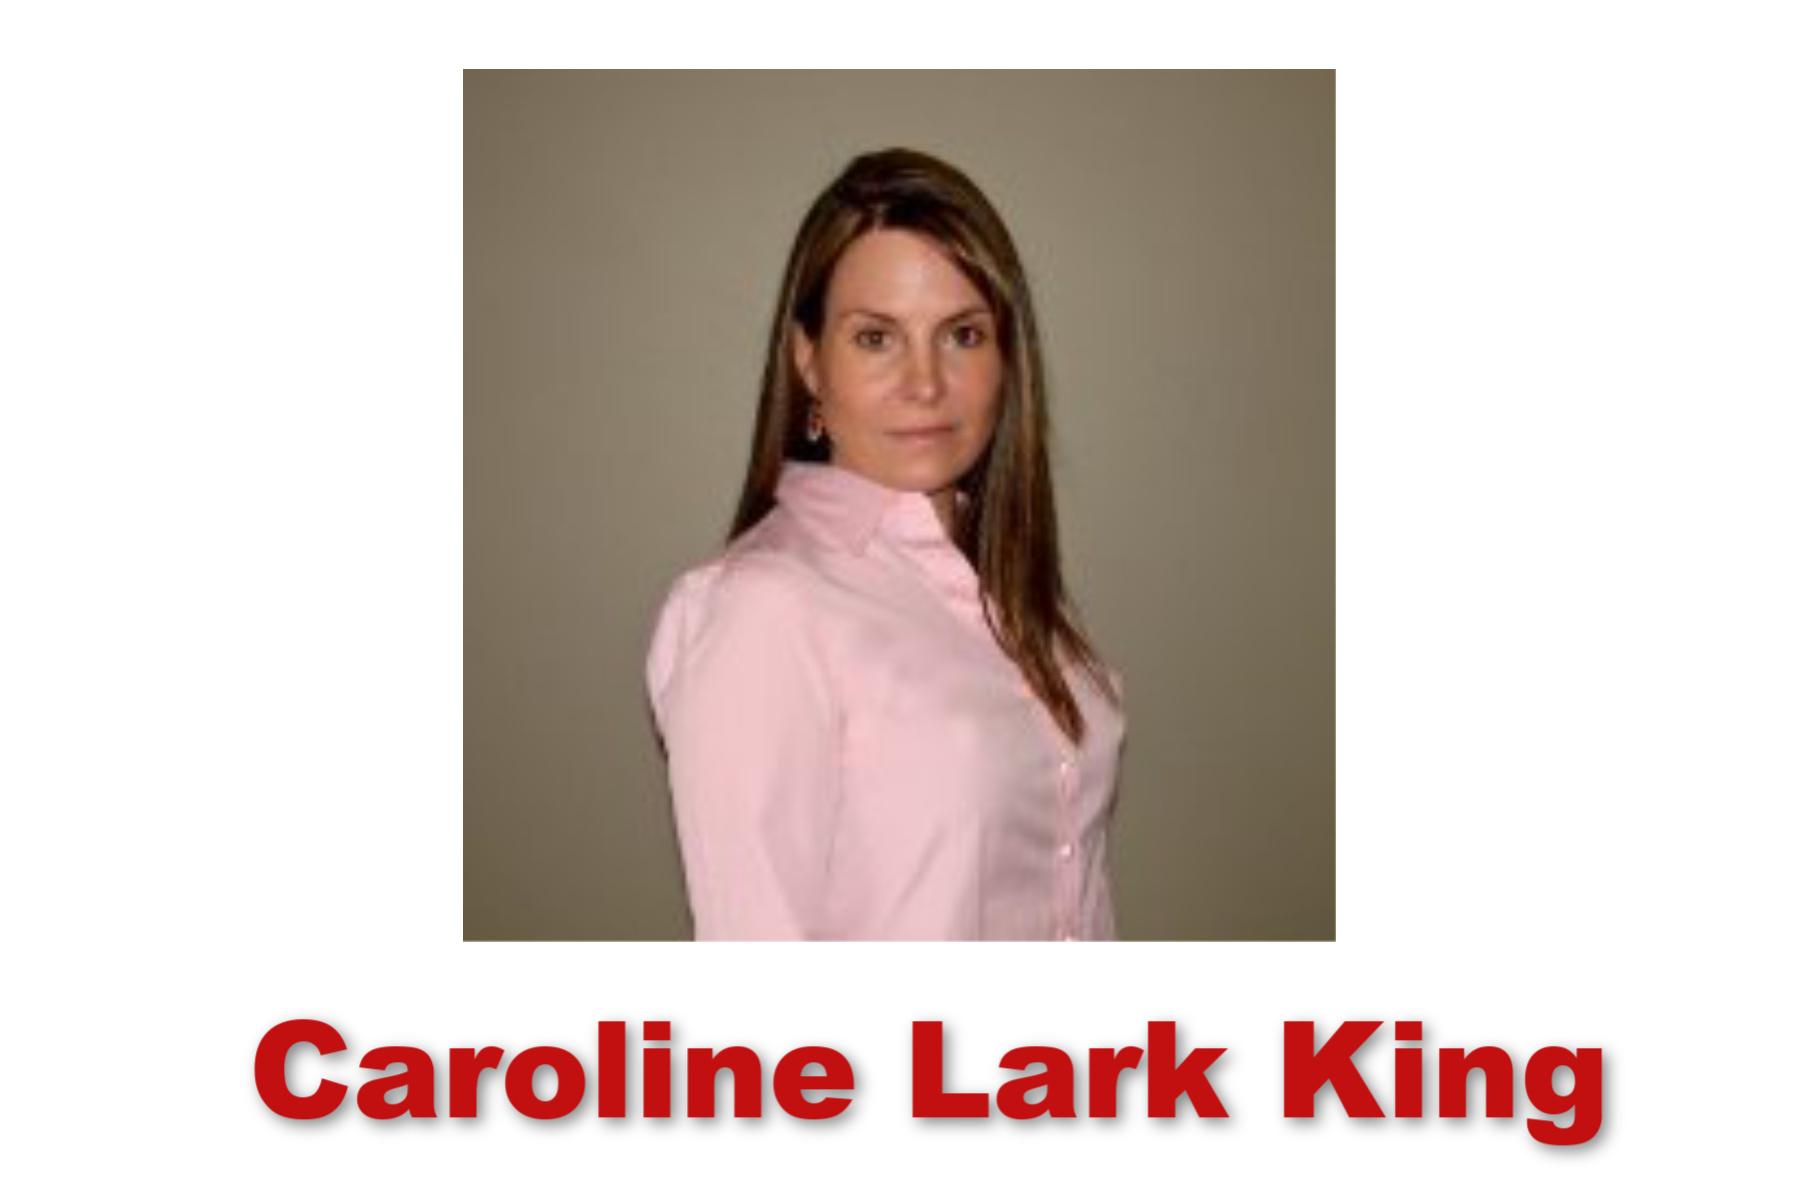 Caroline Lark King